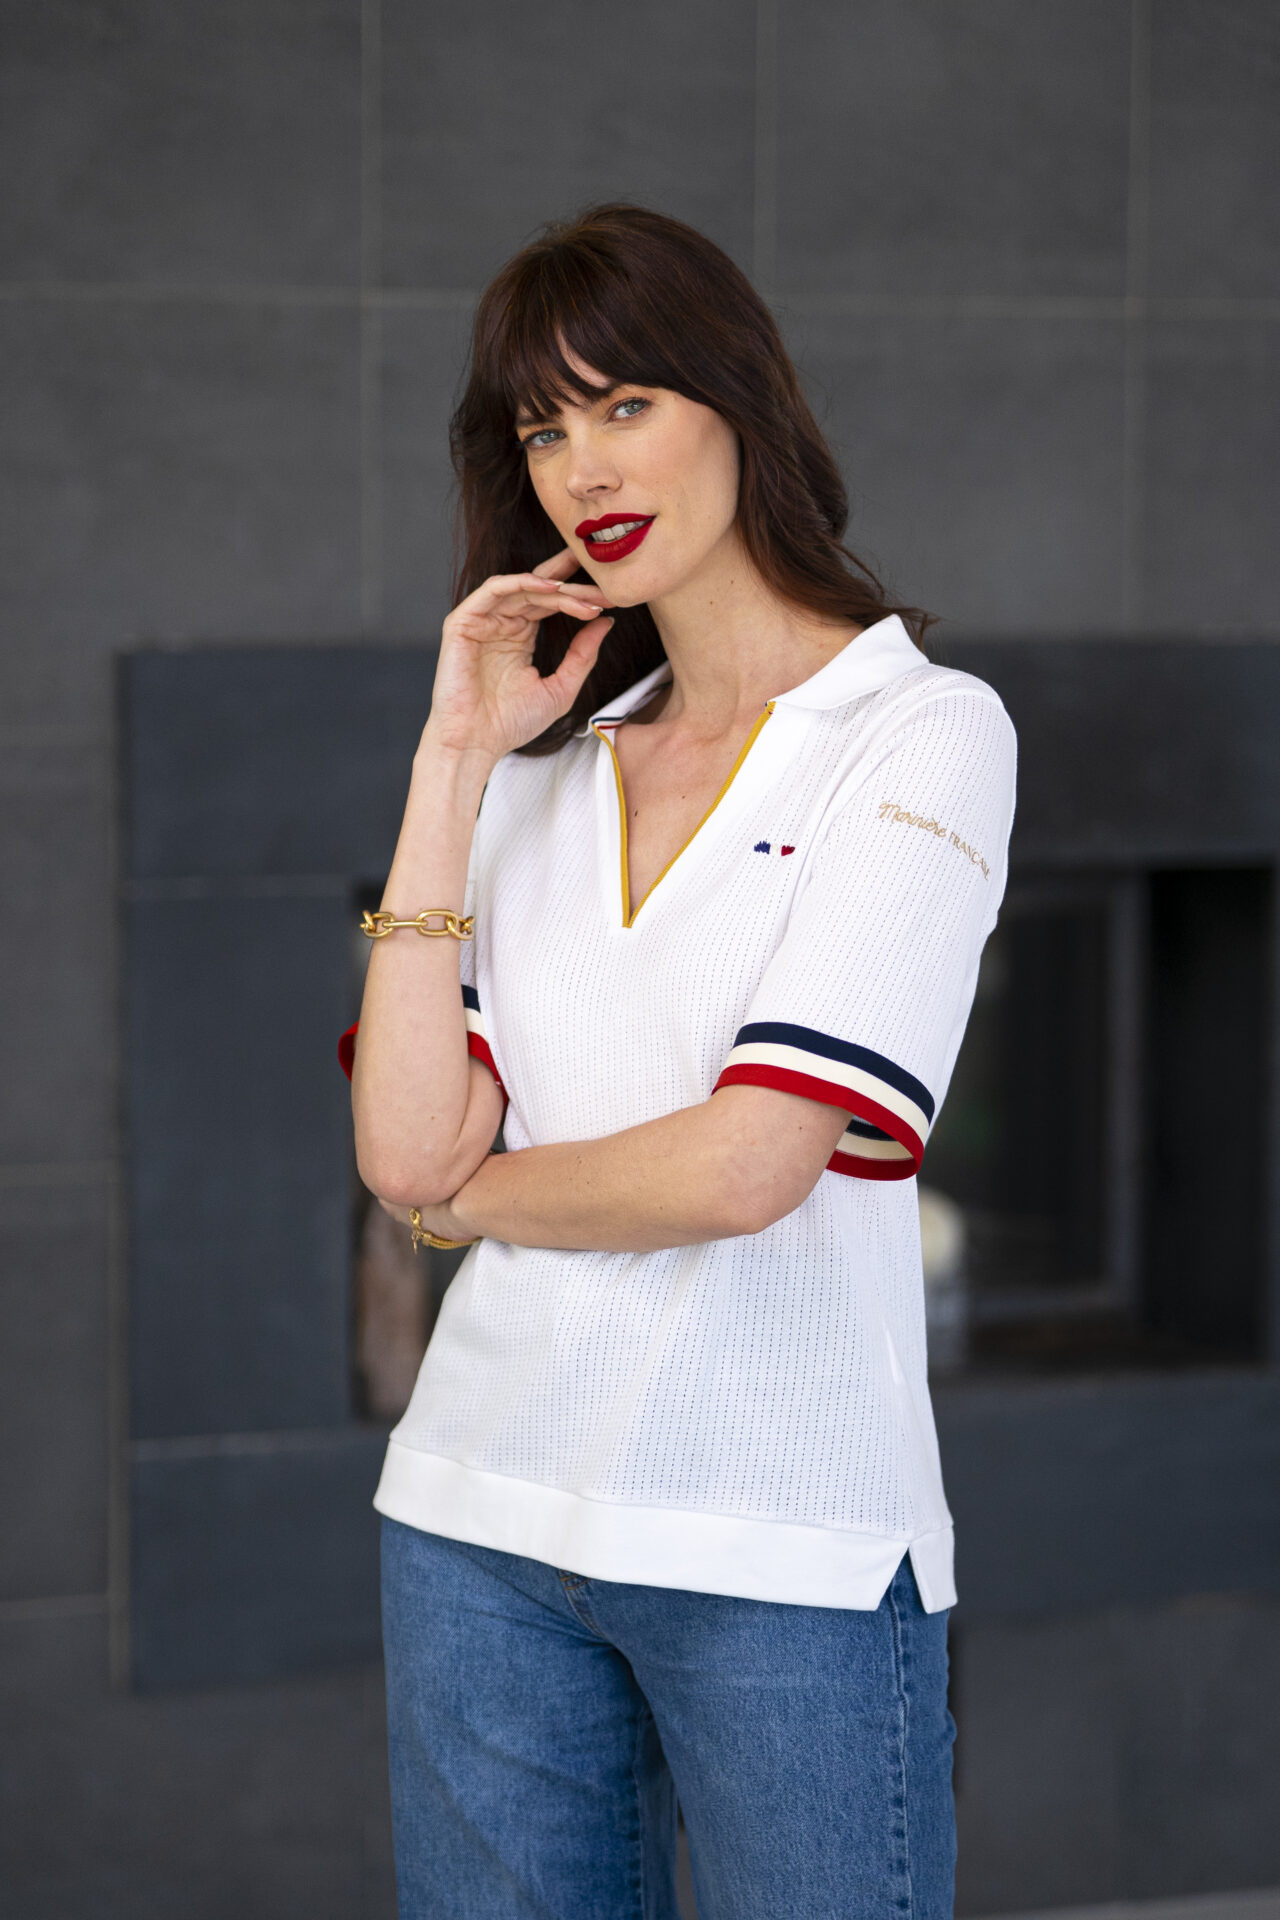 Polo manches courtes Femme